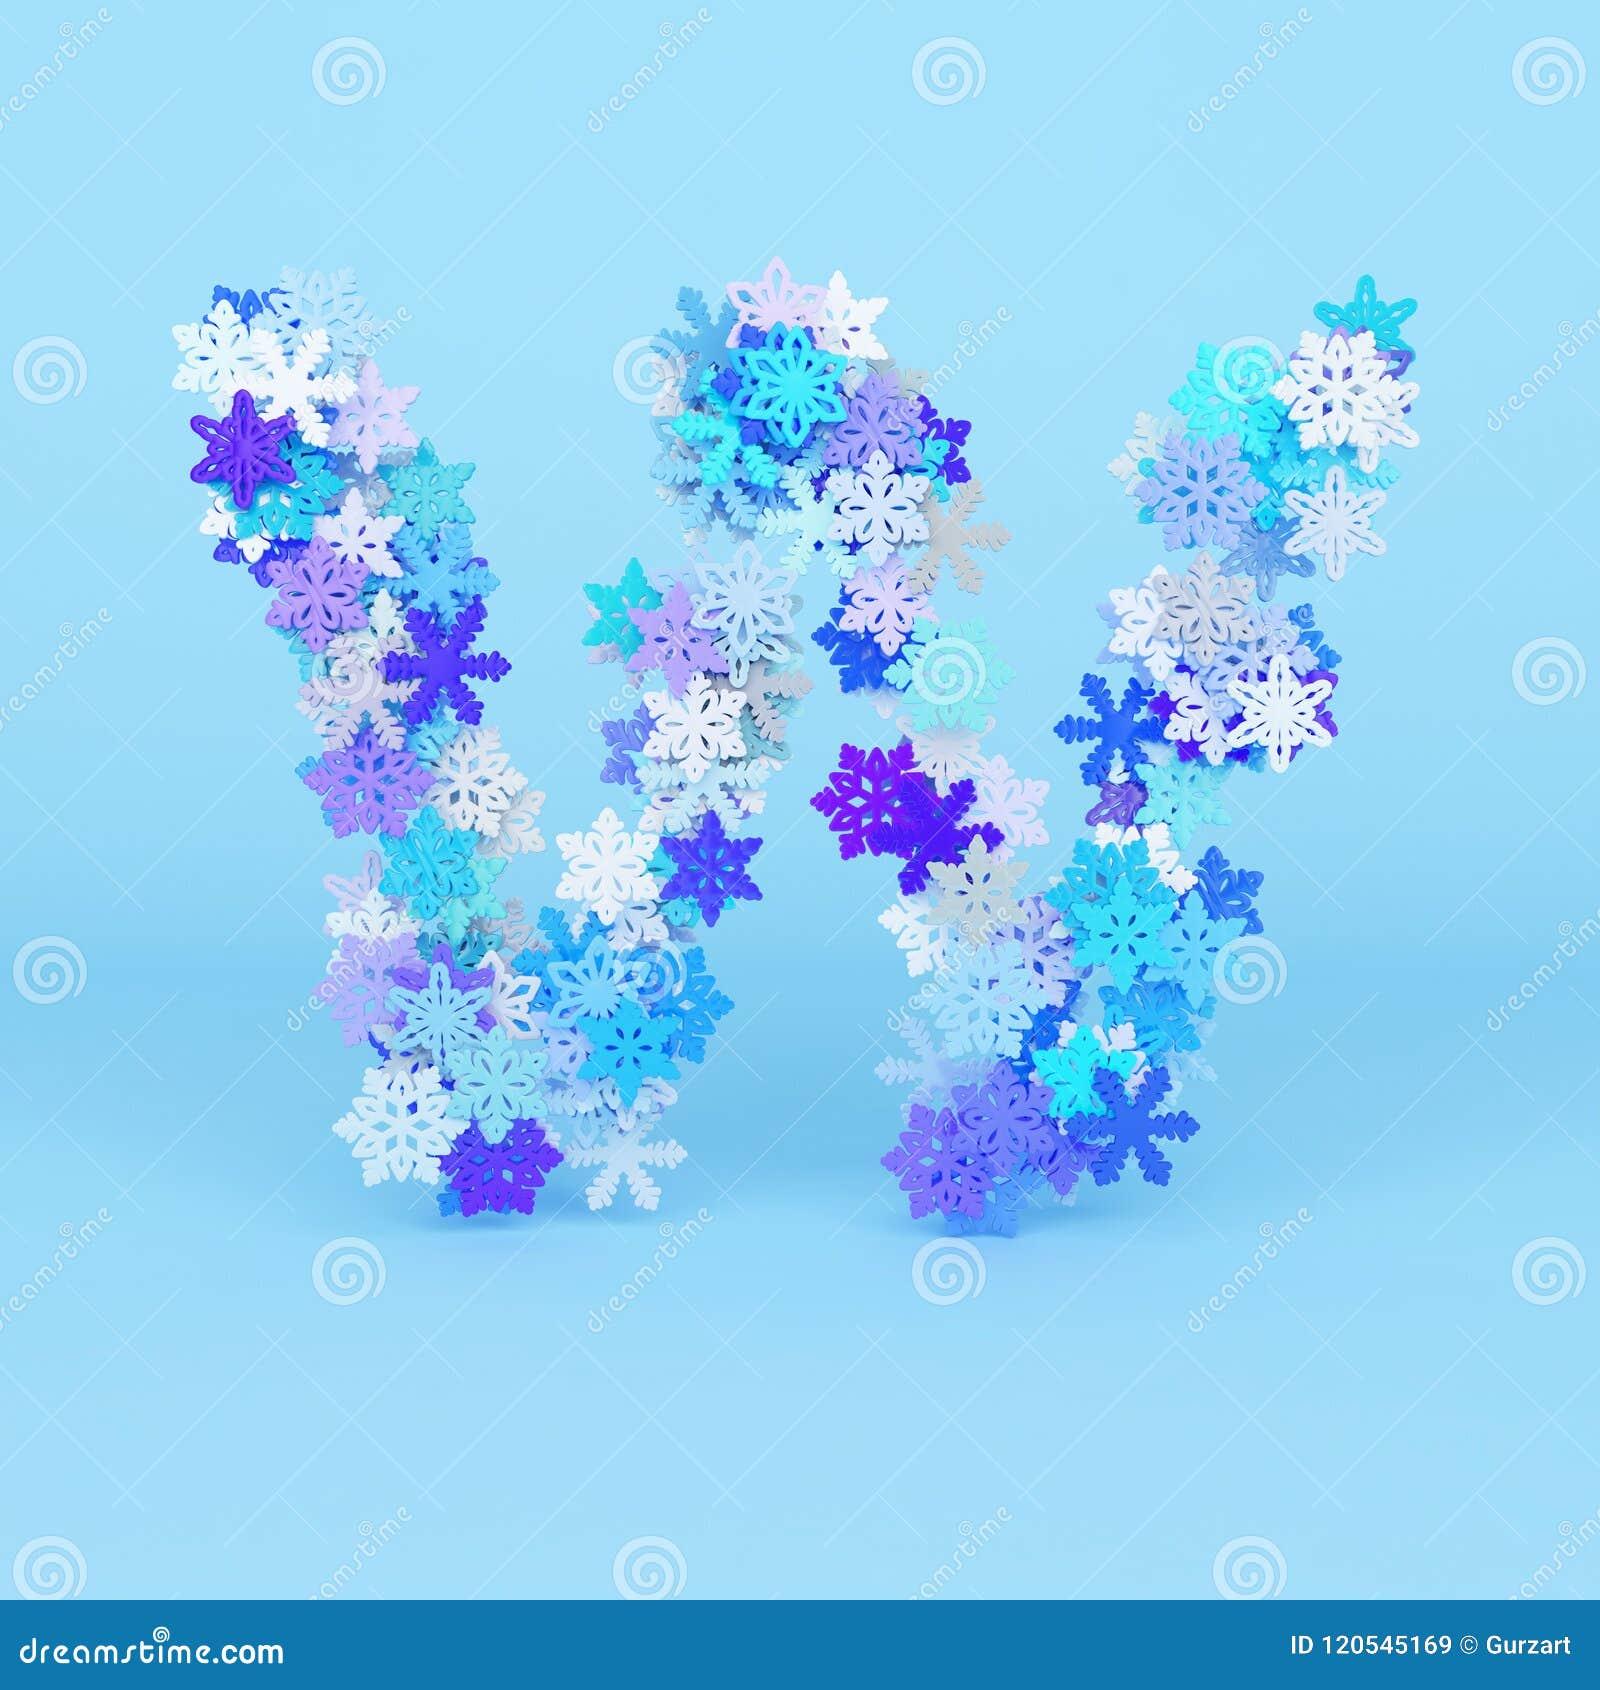 Winter Alphabet Letter W Uppercase Christmas Font Made Of